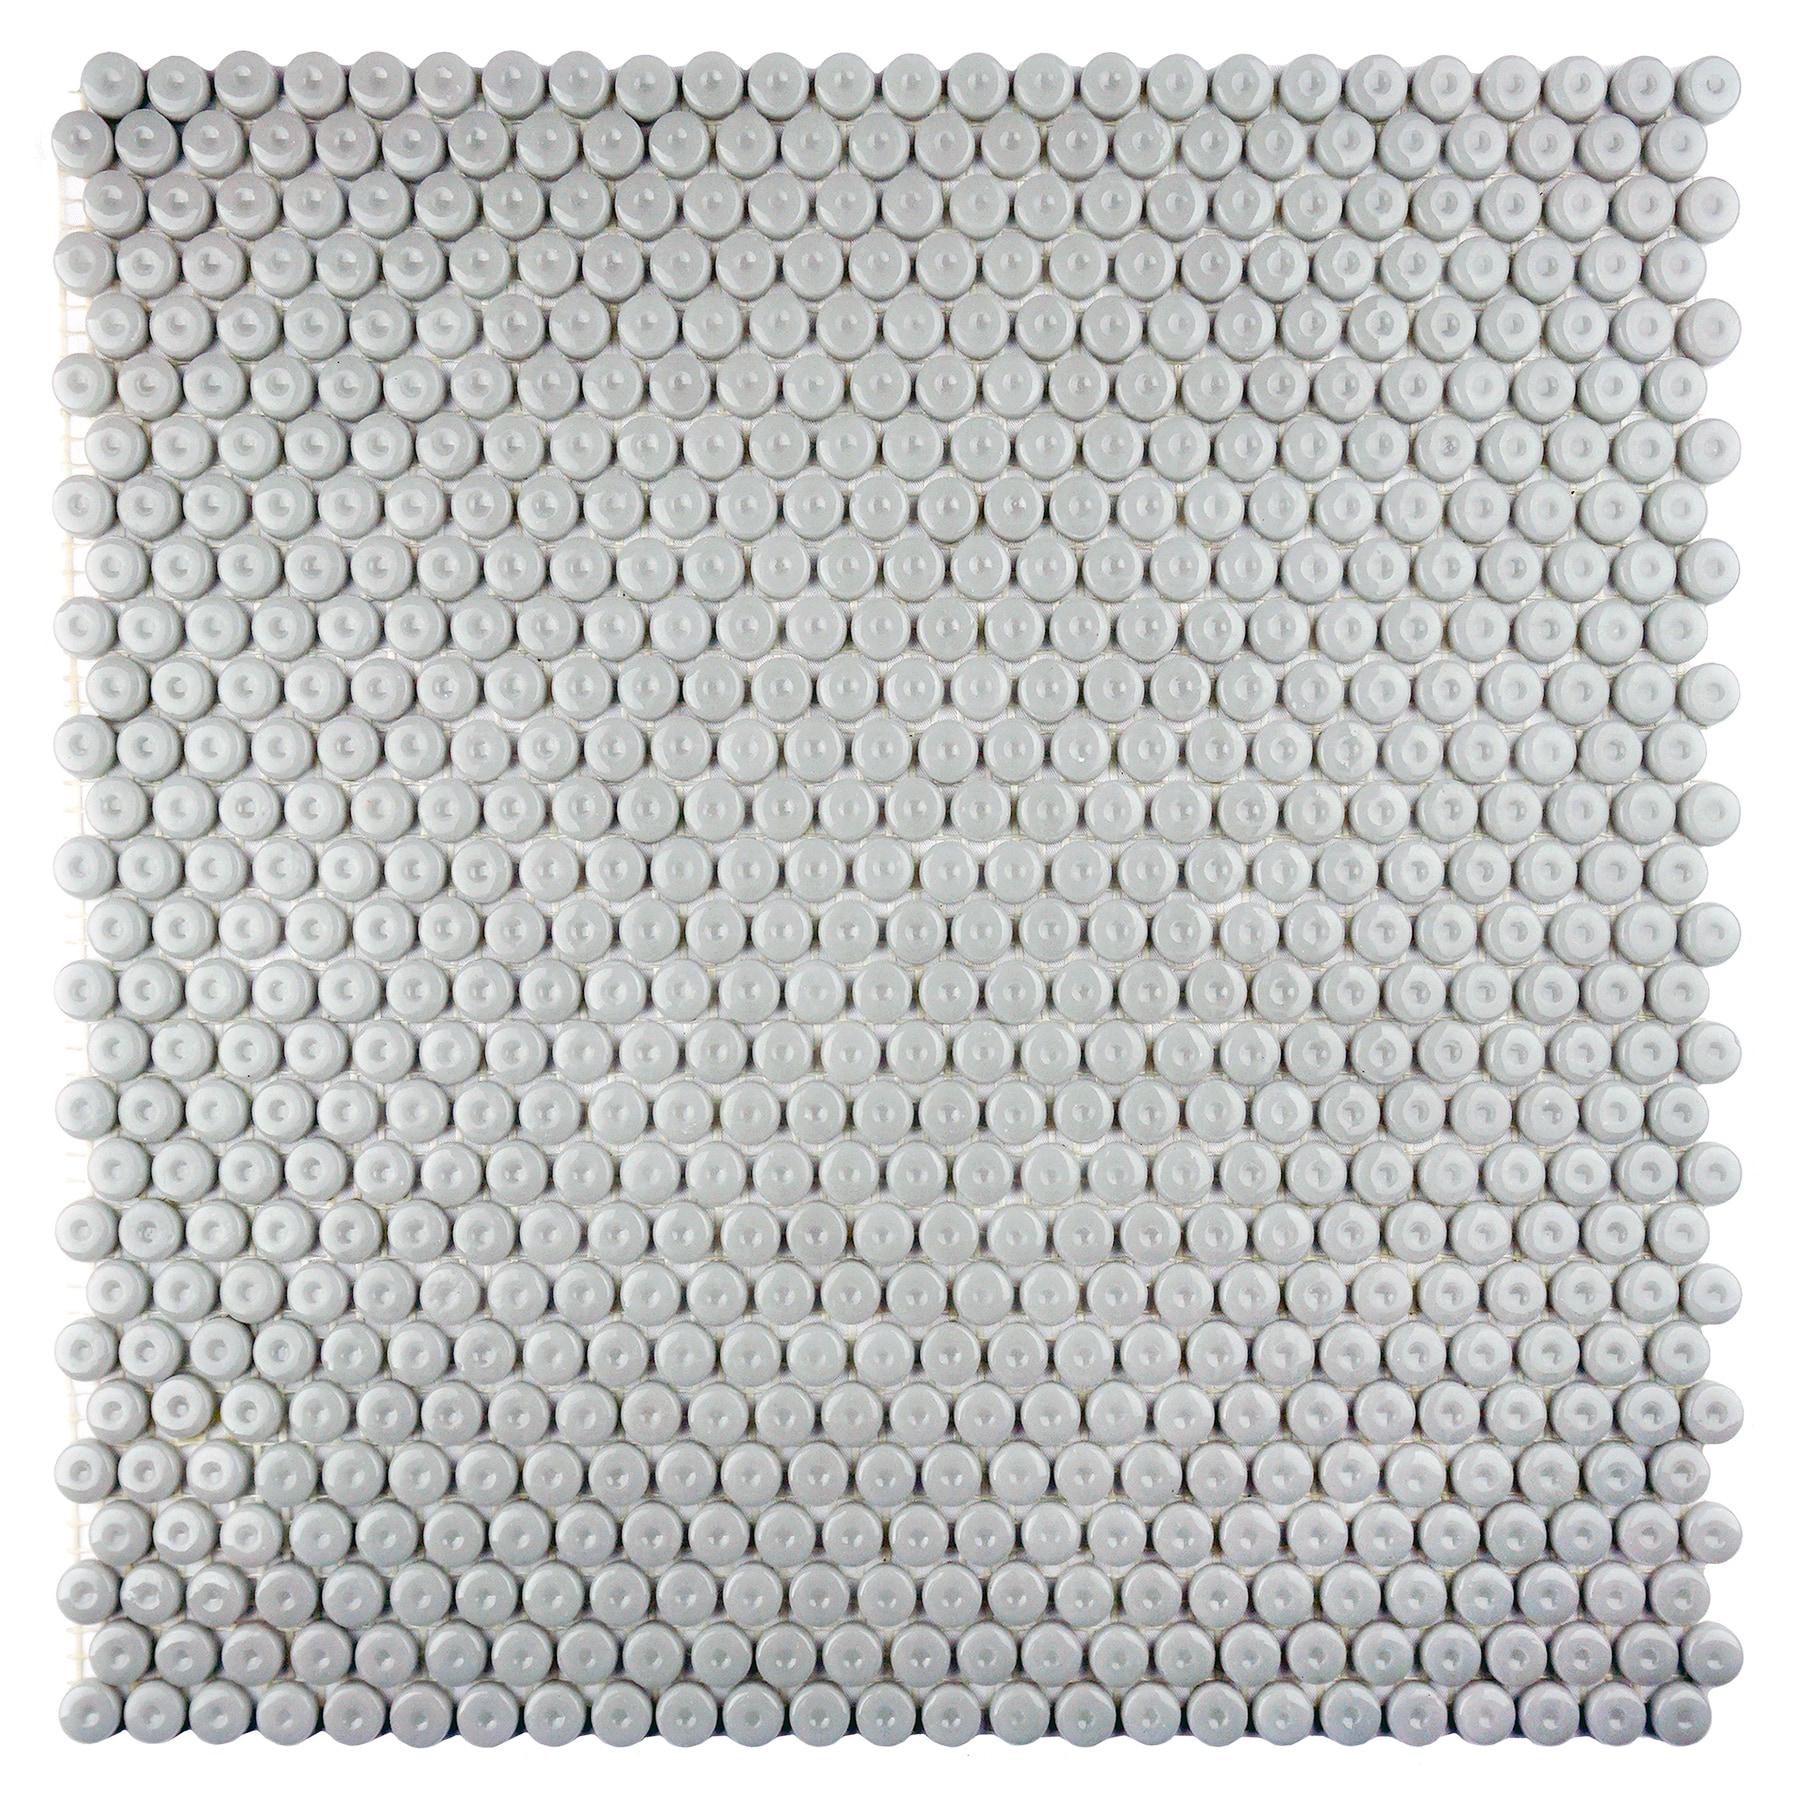 Galahad Glycerin Constantine Glass Mosaic Tile in Galahad 0